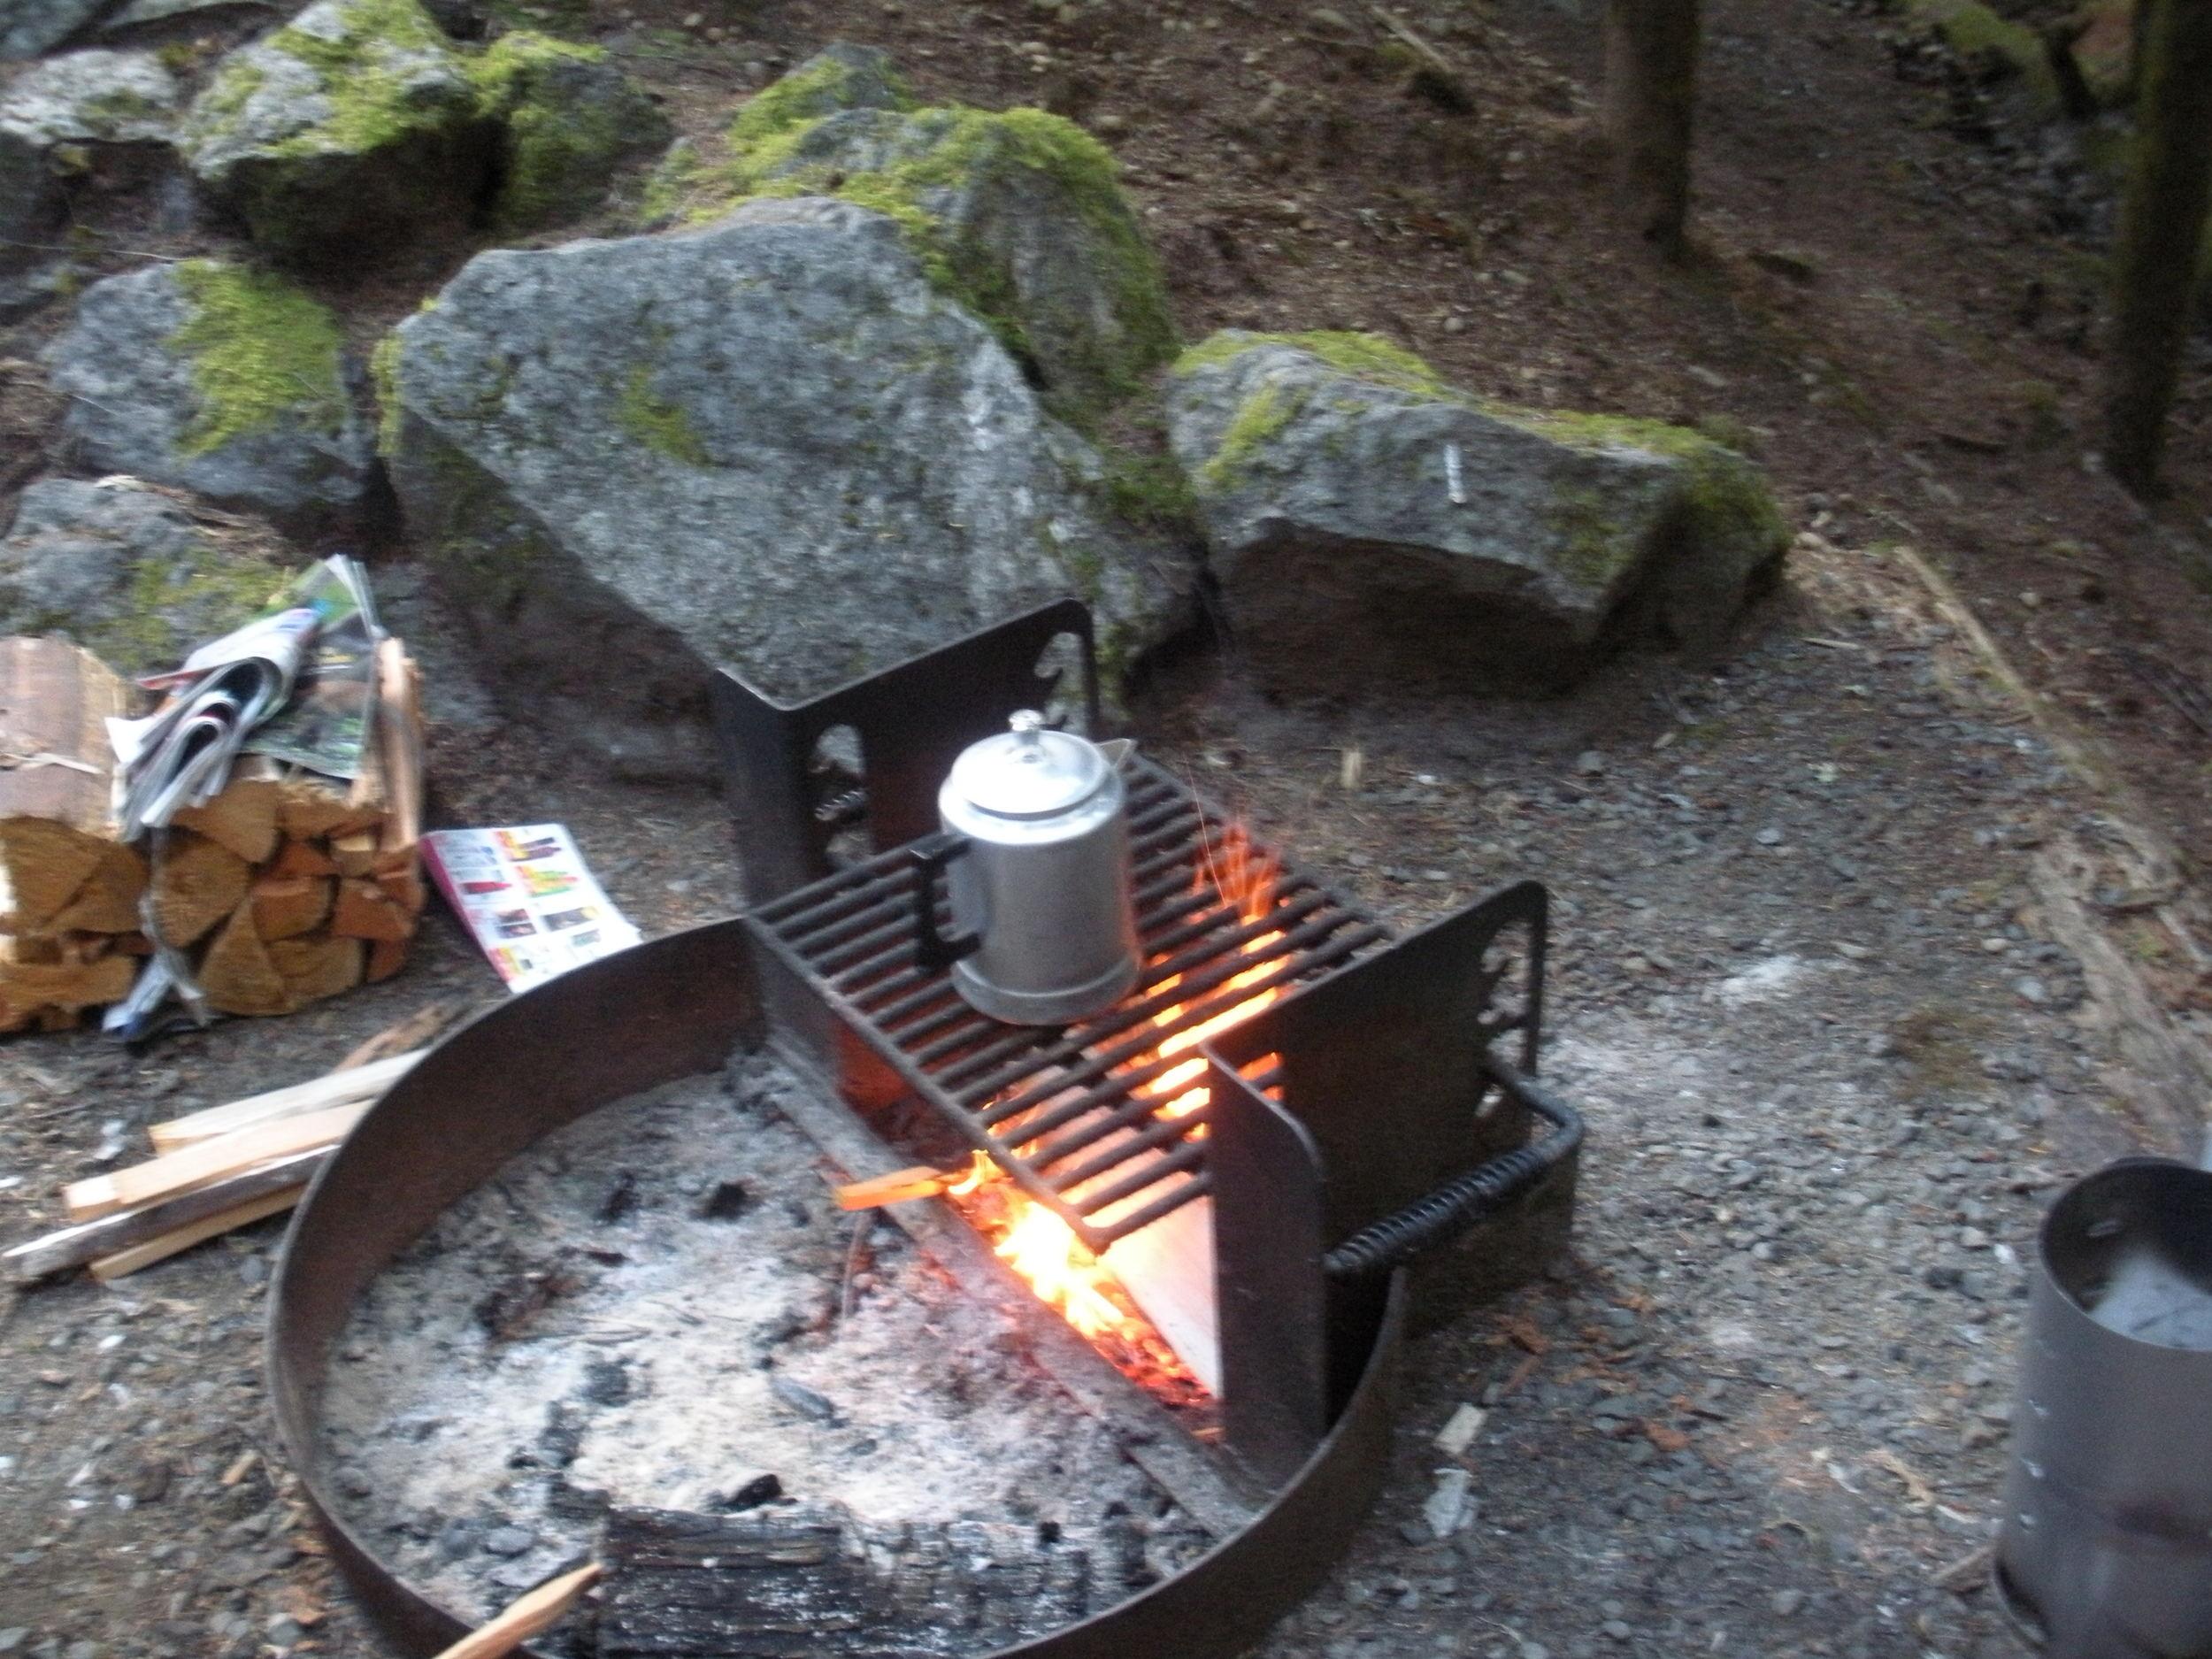 Cowboy coffee on Saturday morning. Breakfast menu: bacon, eggs, and leftover cornbread